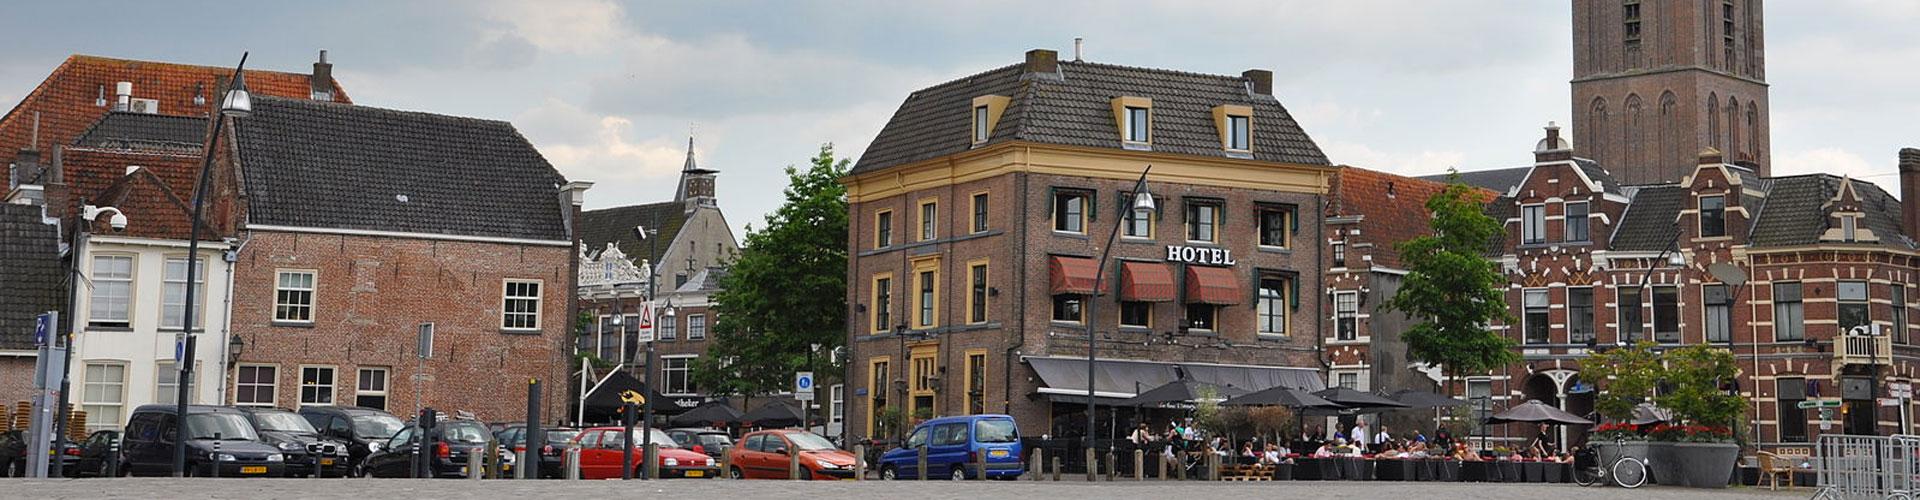 Letselschade Zwolle advocaat inschakelen